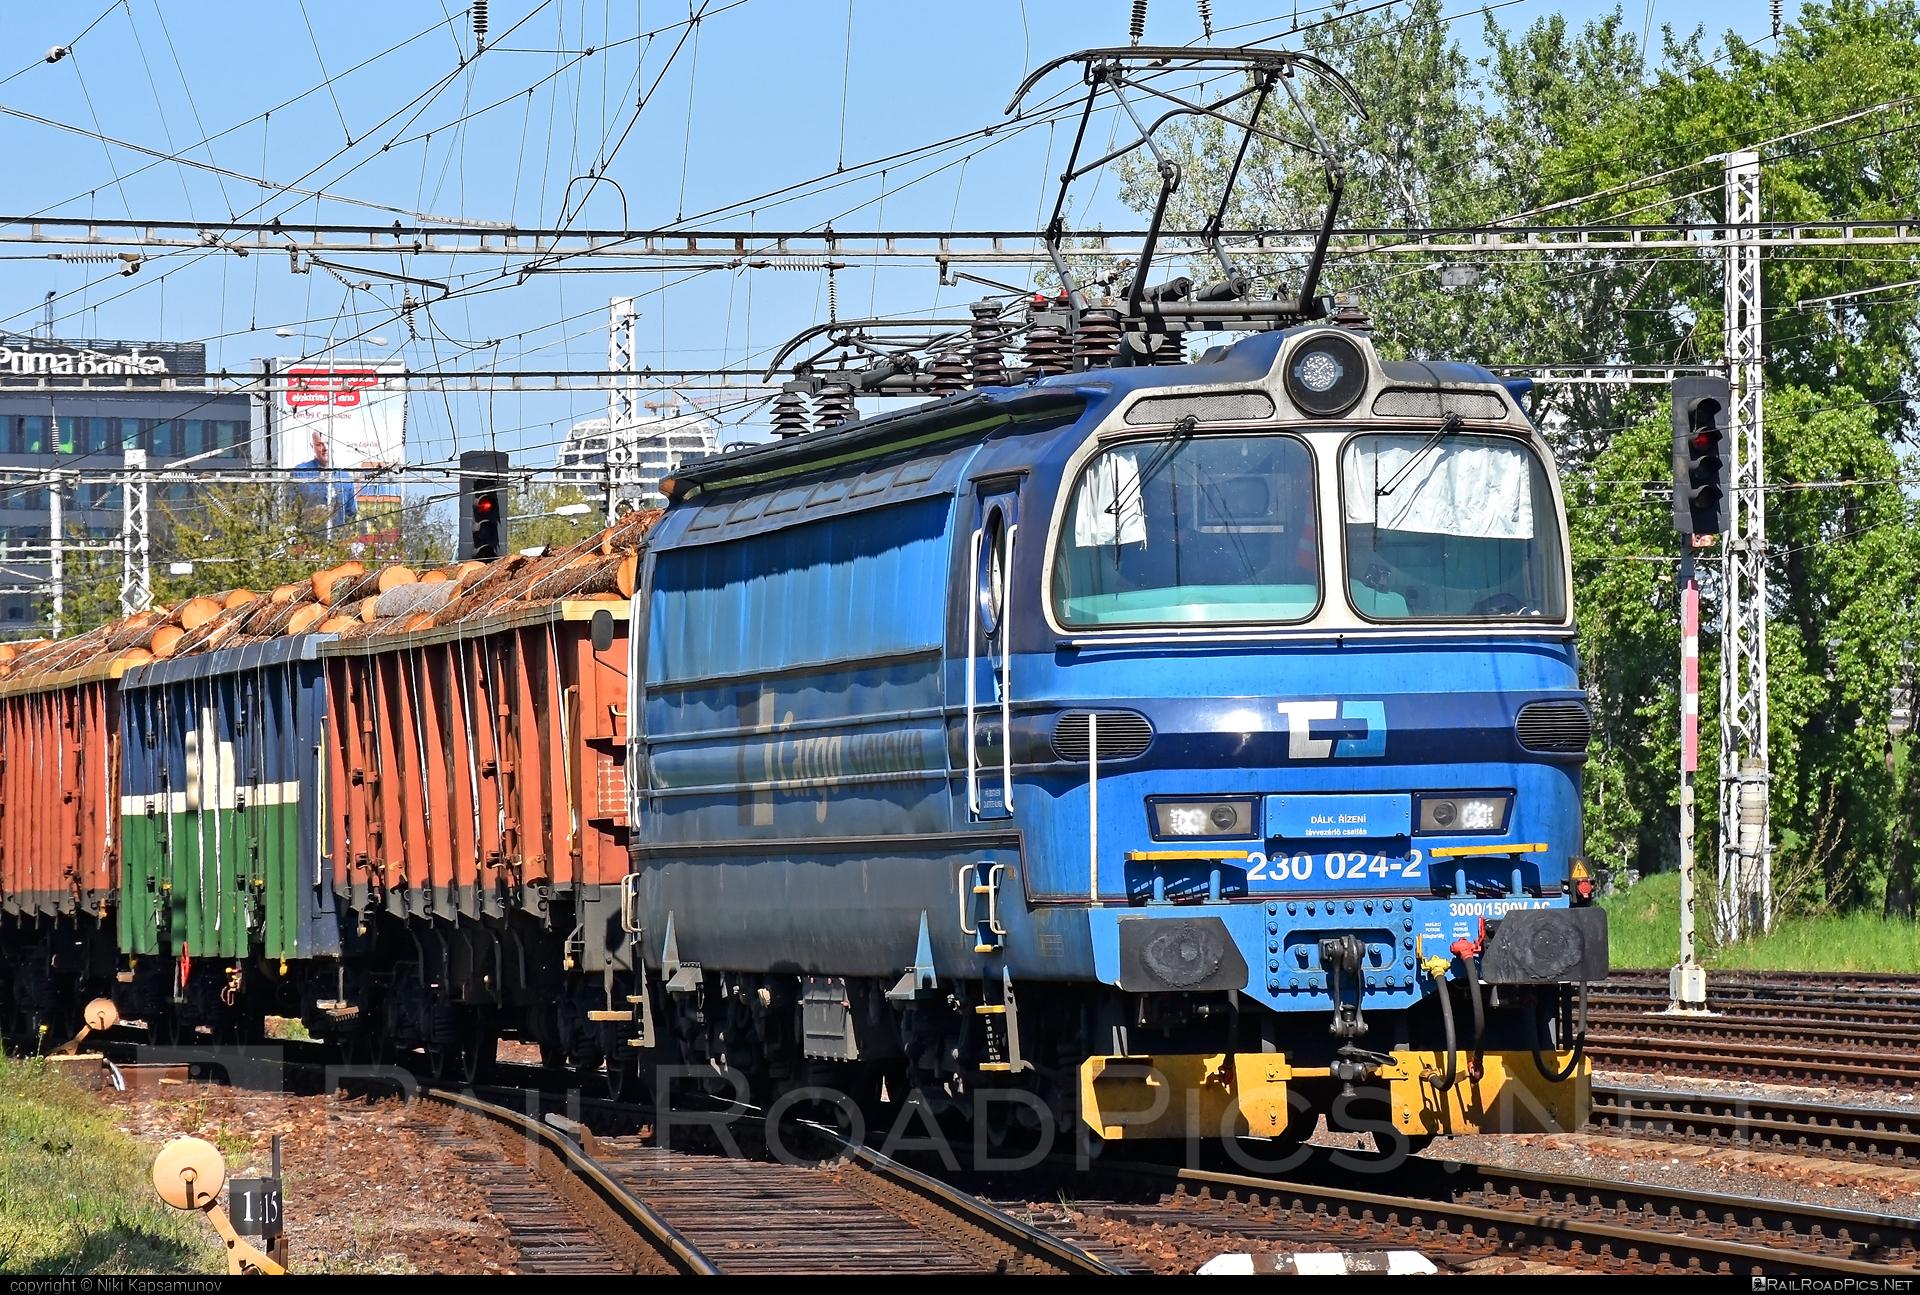 Škoda 47E - 230 024-2 operated by CD Cargo Slovakia, s.r.o. #cd #cdcargo #cdcargoslovakia #cdcsk #laminatka #locomotive240 #skoda #skoda47e